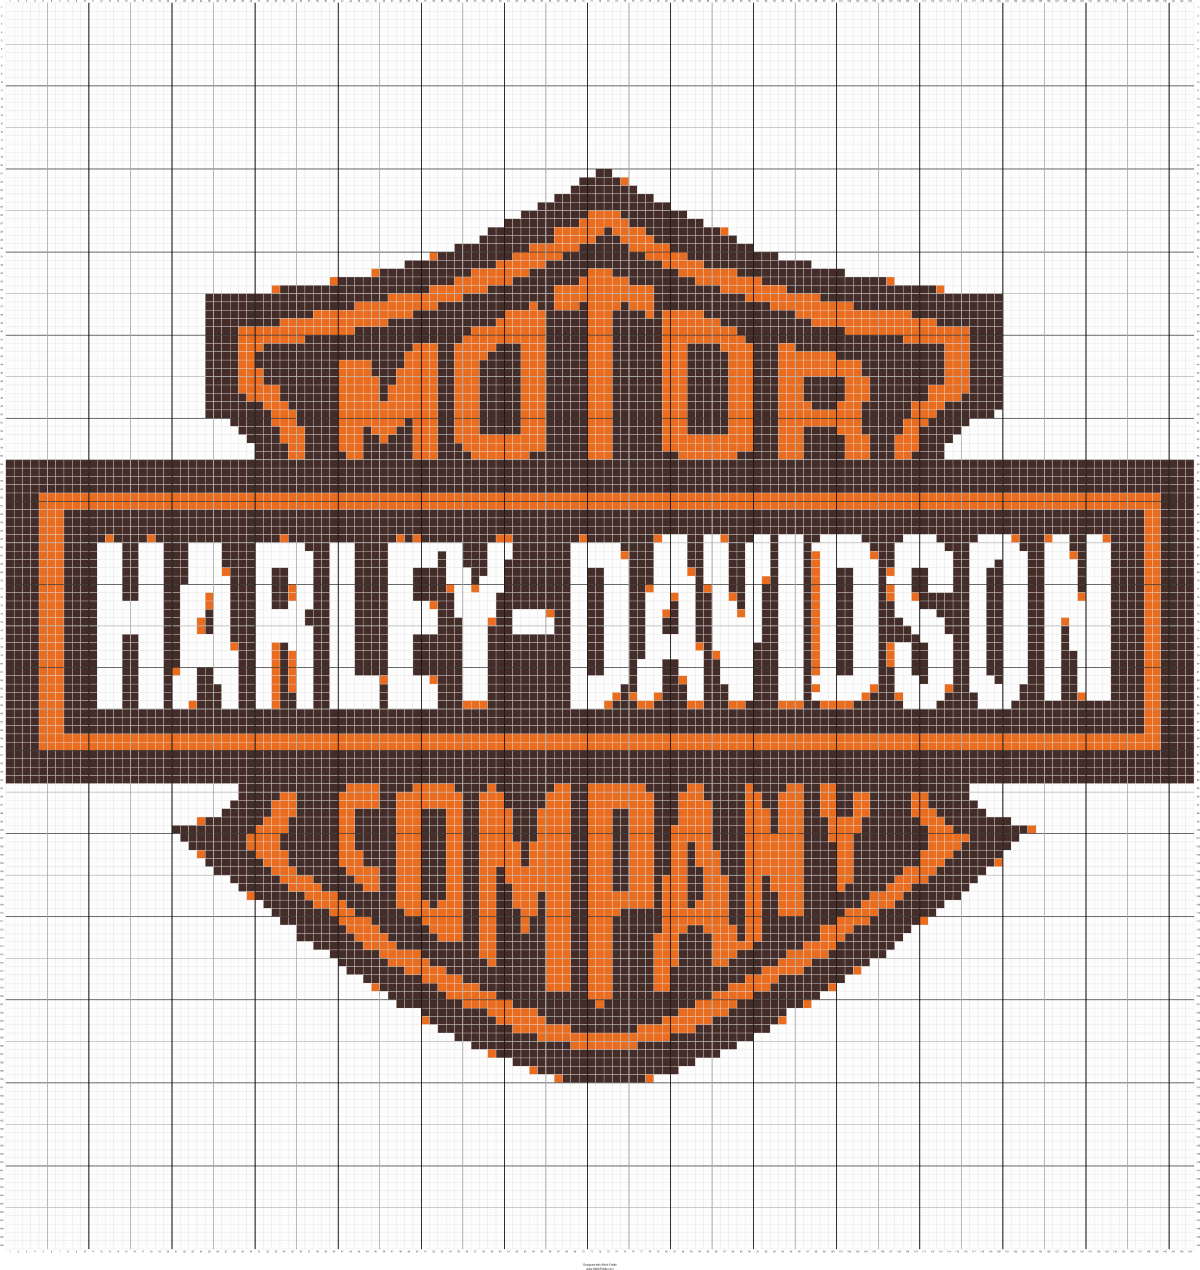 Harley Davidson Graph To Make A C2c Afghan Afghan Patterns